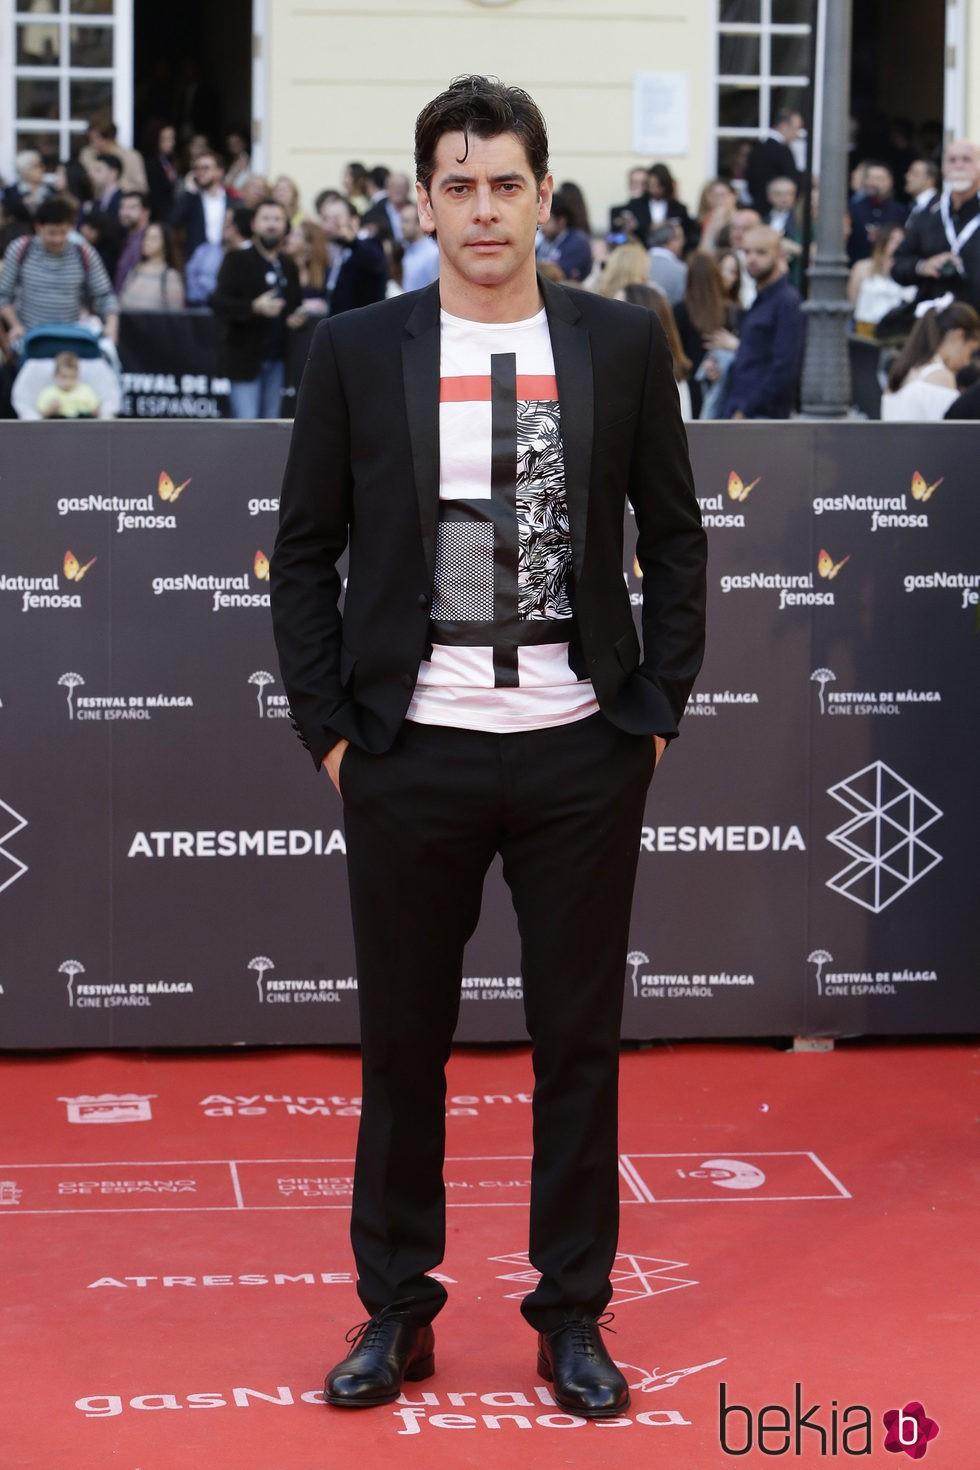 Eduardo Noriega en la clausura del Festival de Málaga 2016